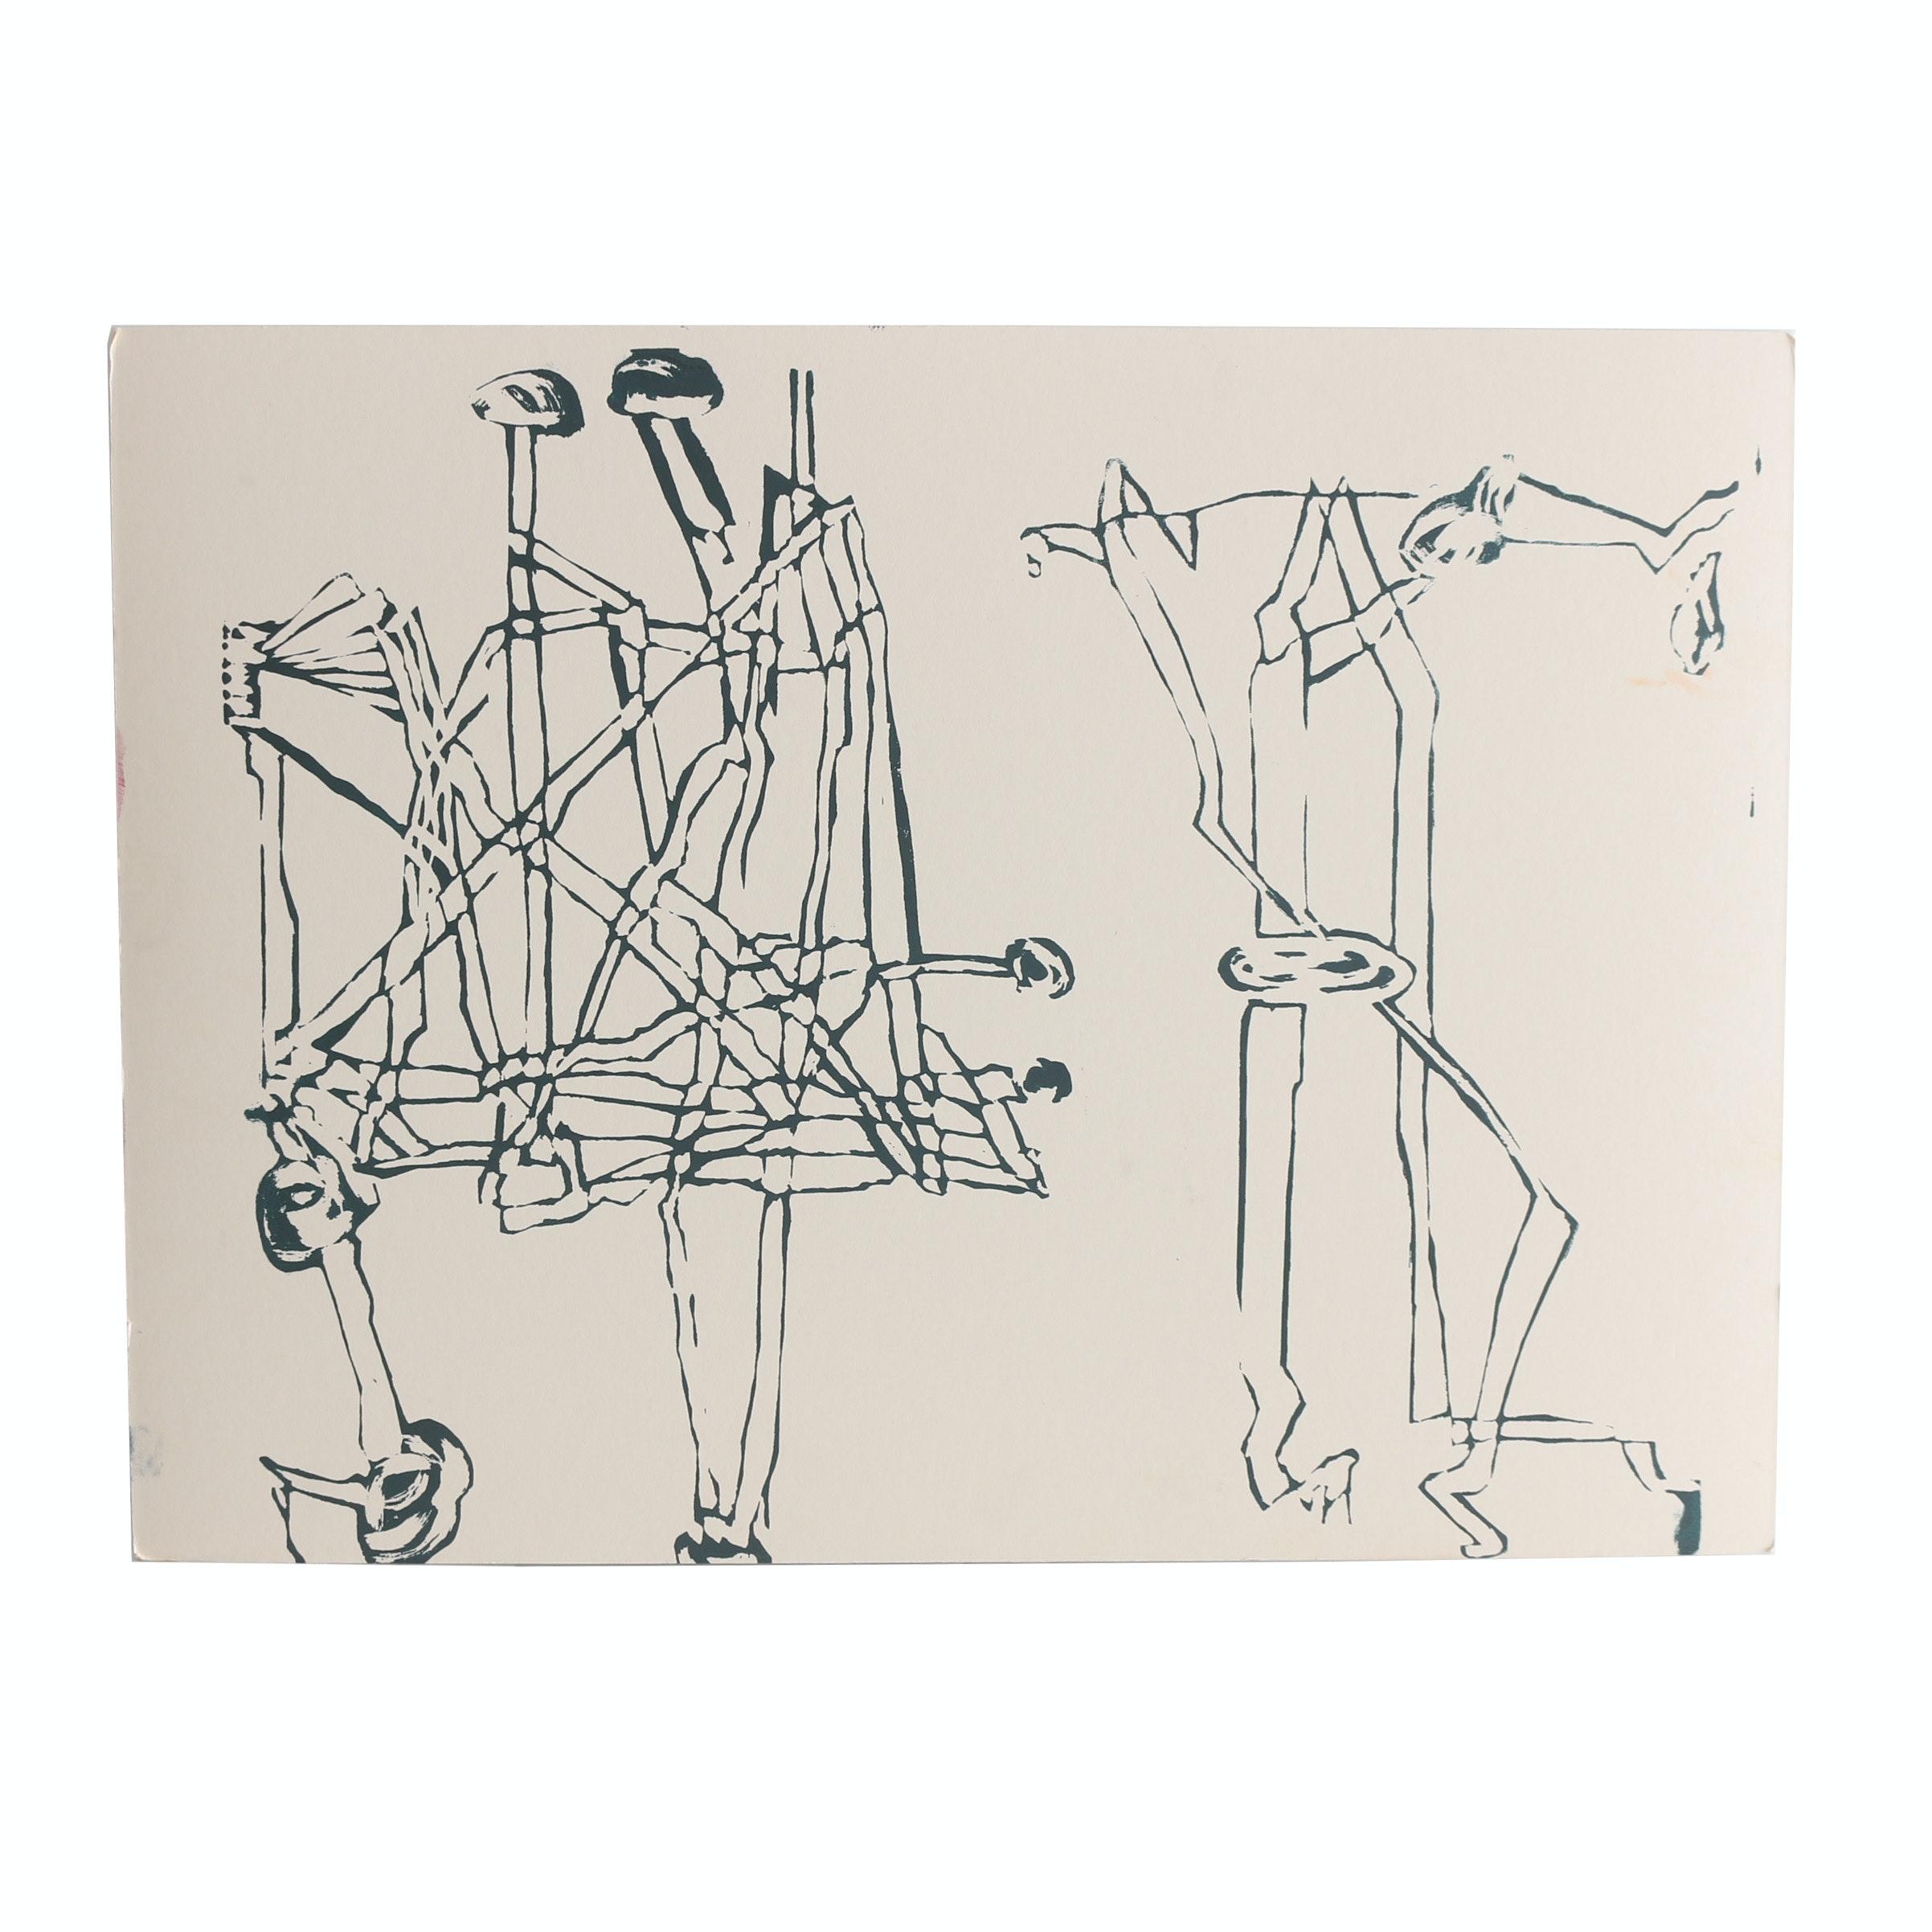 Robert Bolubasz and Unknown Artist 2016 Relief Print on Illustration Board